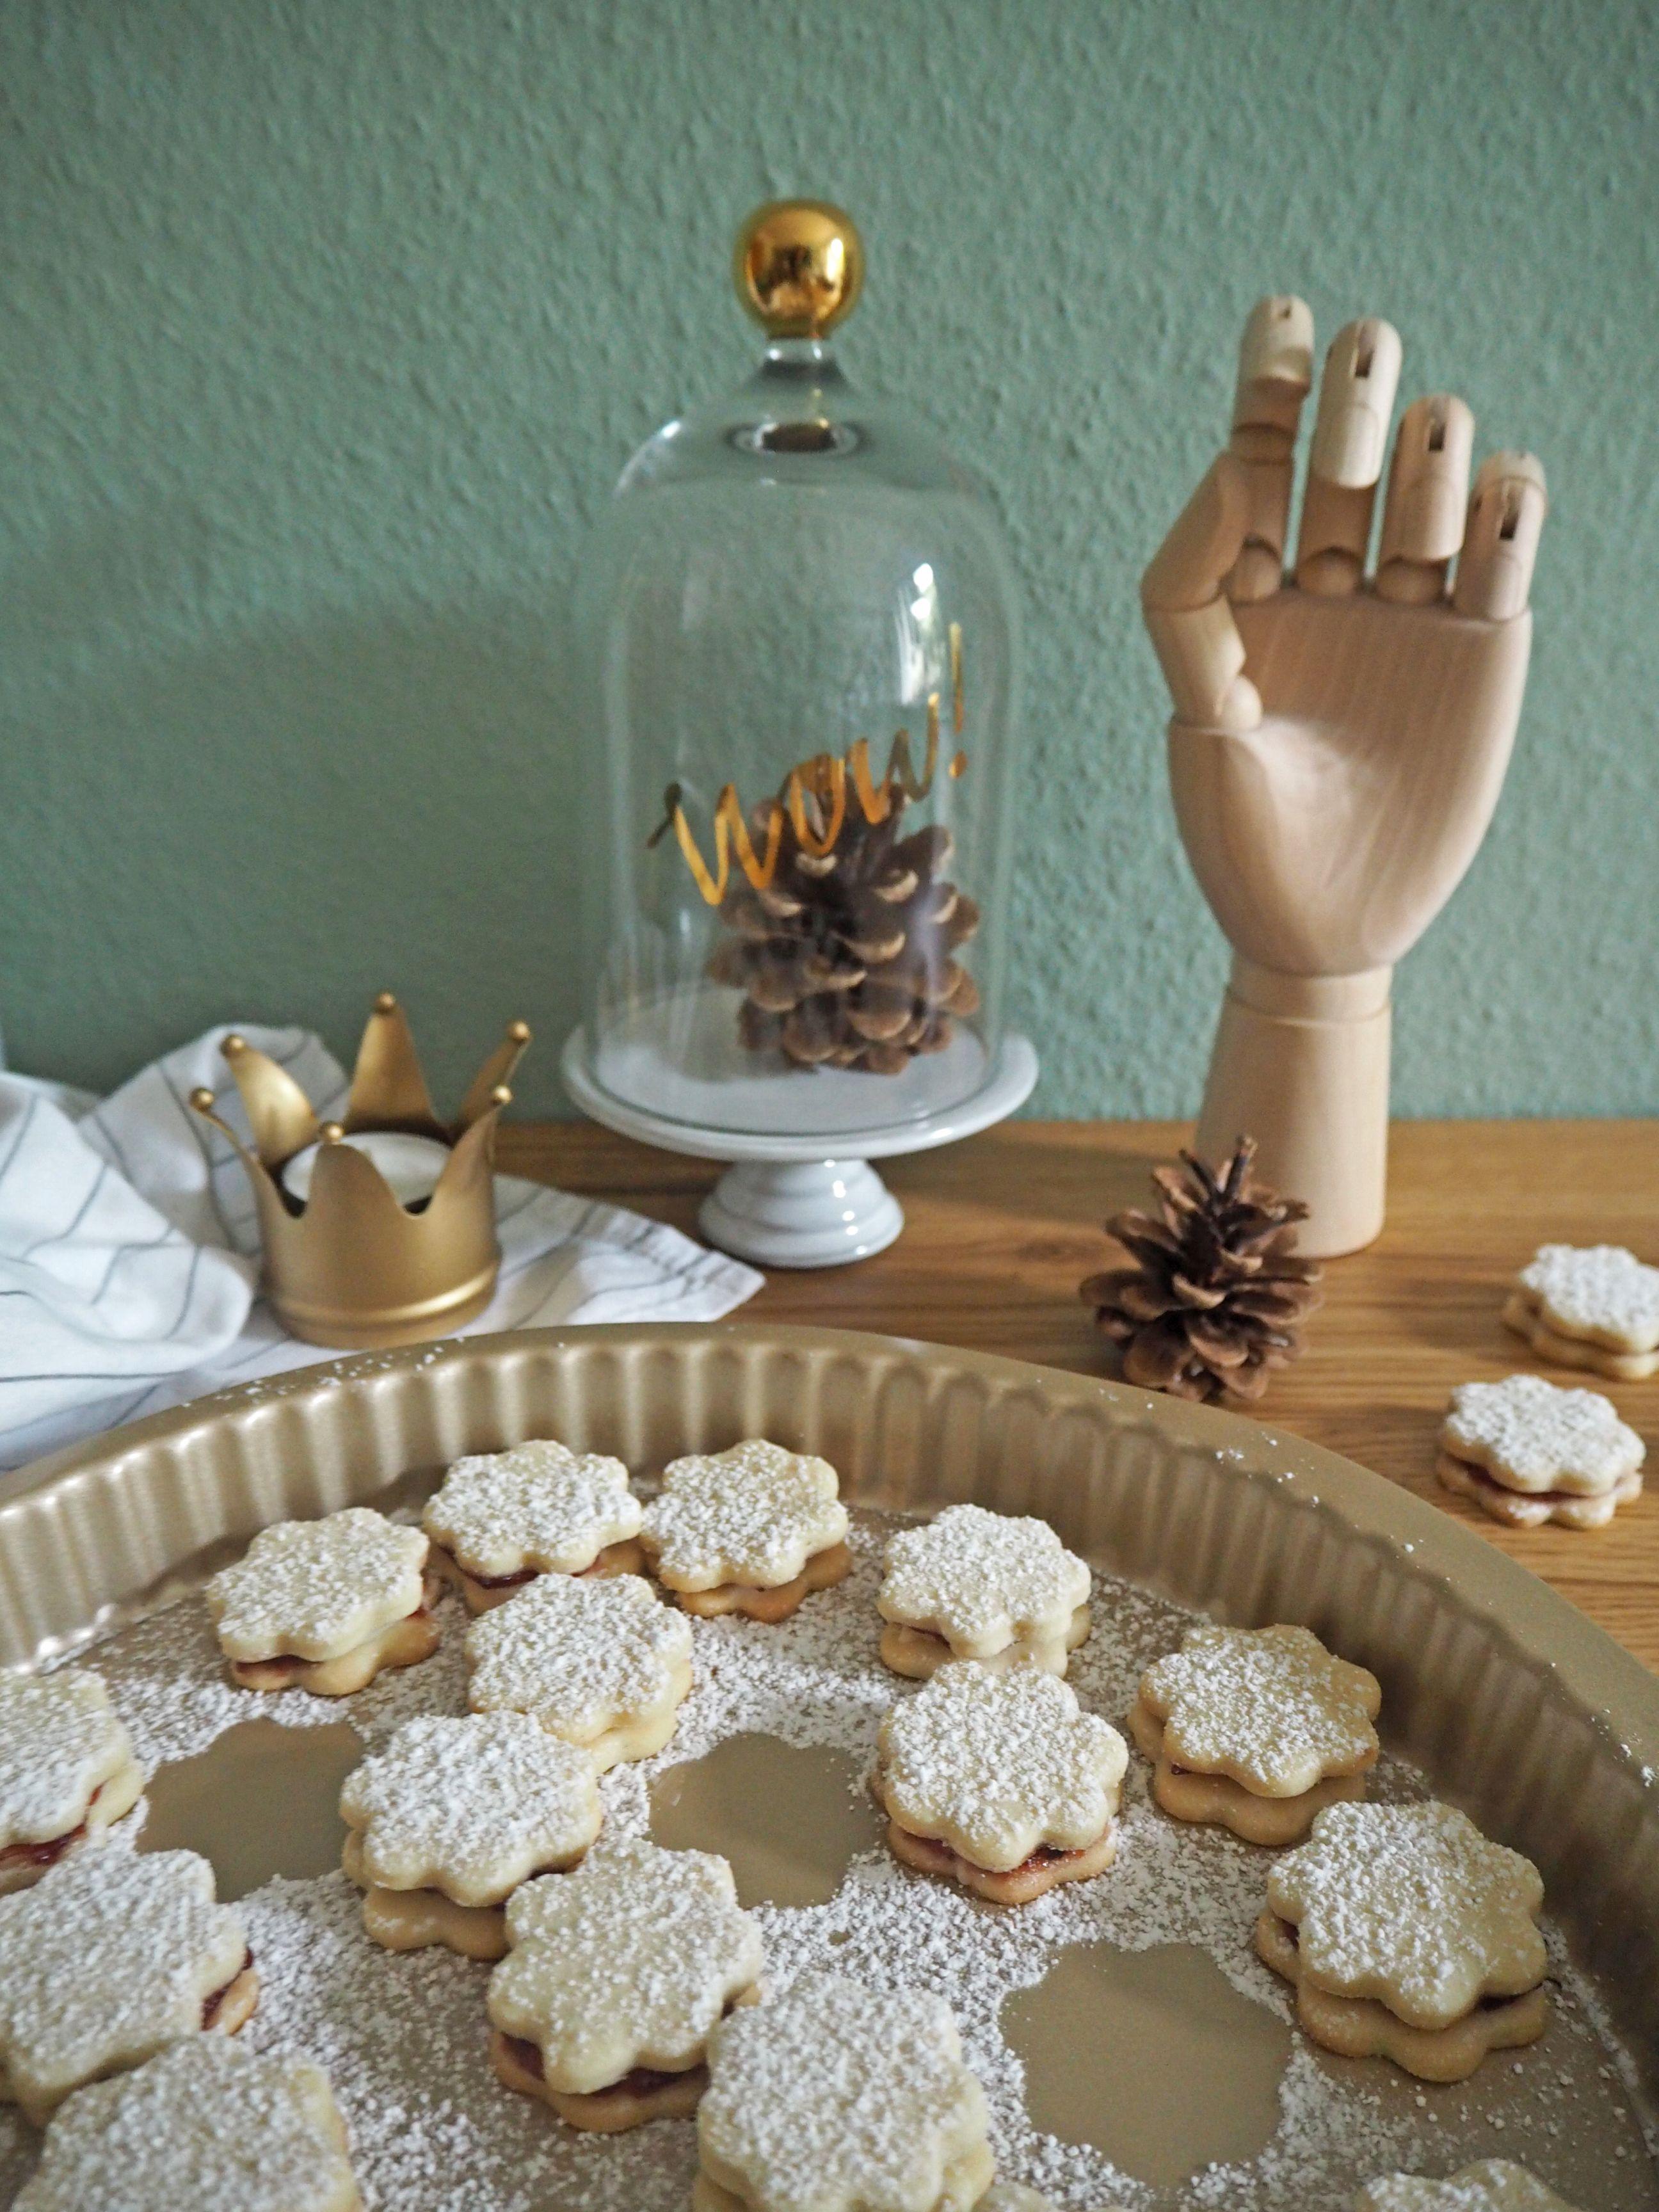 2018-skoen-och-kreativ-food-god-jul-plaetzchen-vanille-cookies-mit-marmelade (9)